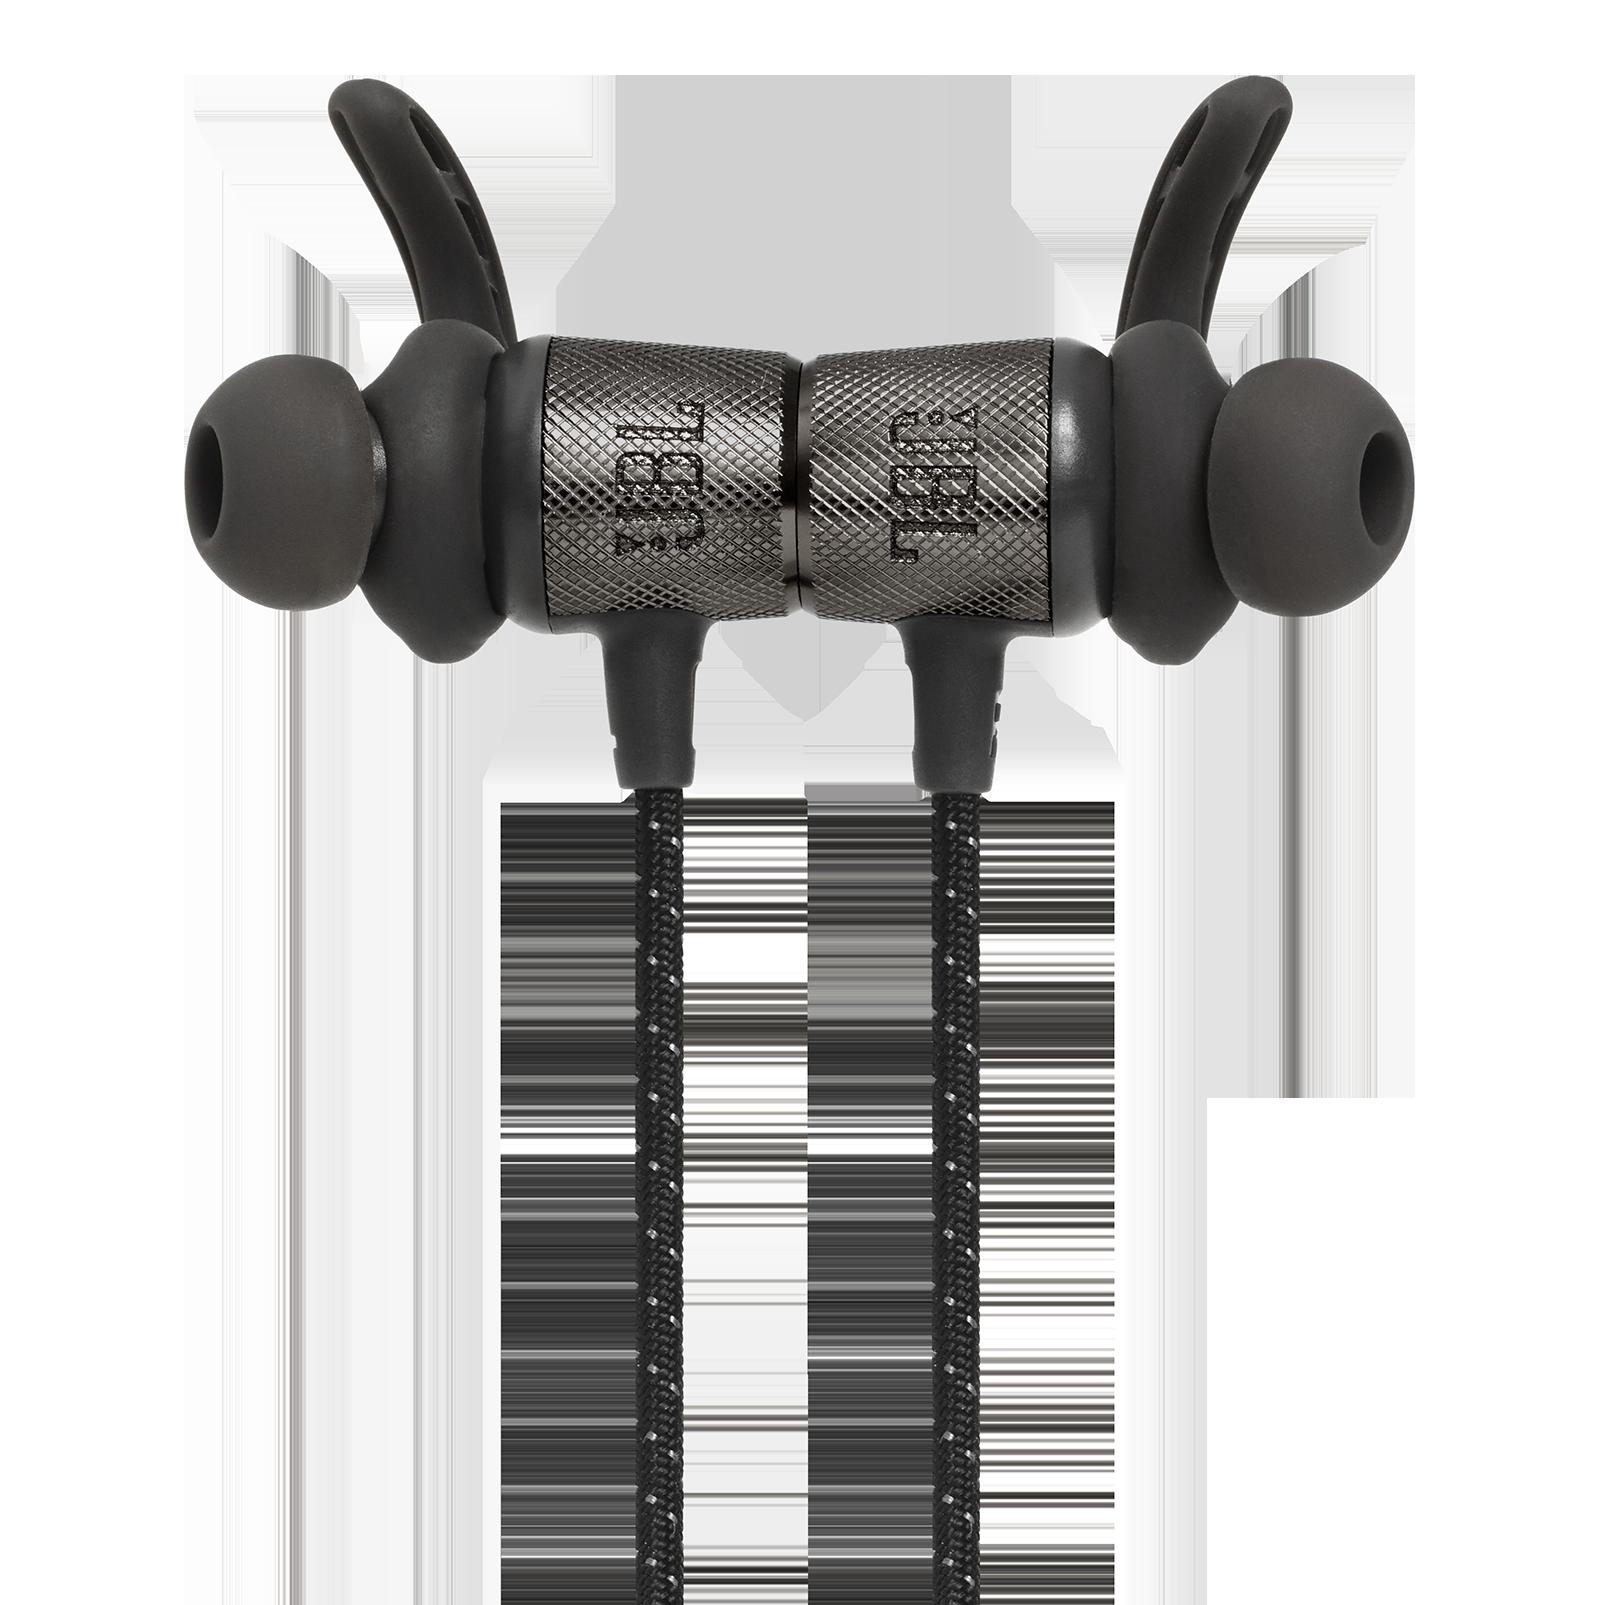 UA Sport Wireless REACT - Black - Secure-fitting wireless sport earphones with JBL technology and sound - Detailshot 1